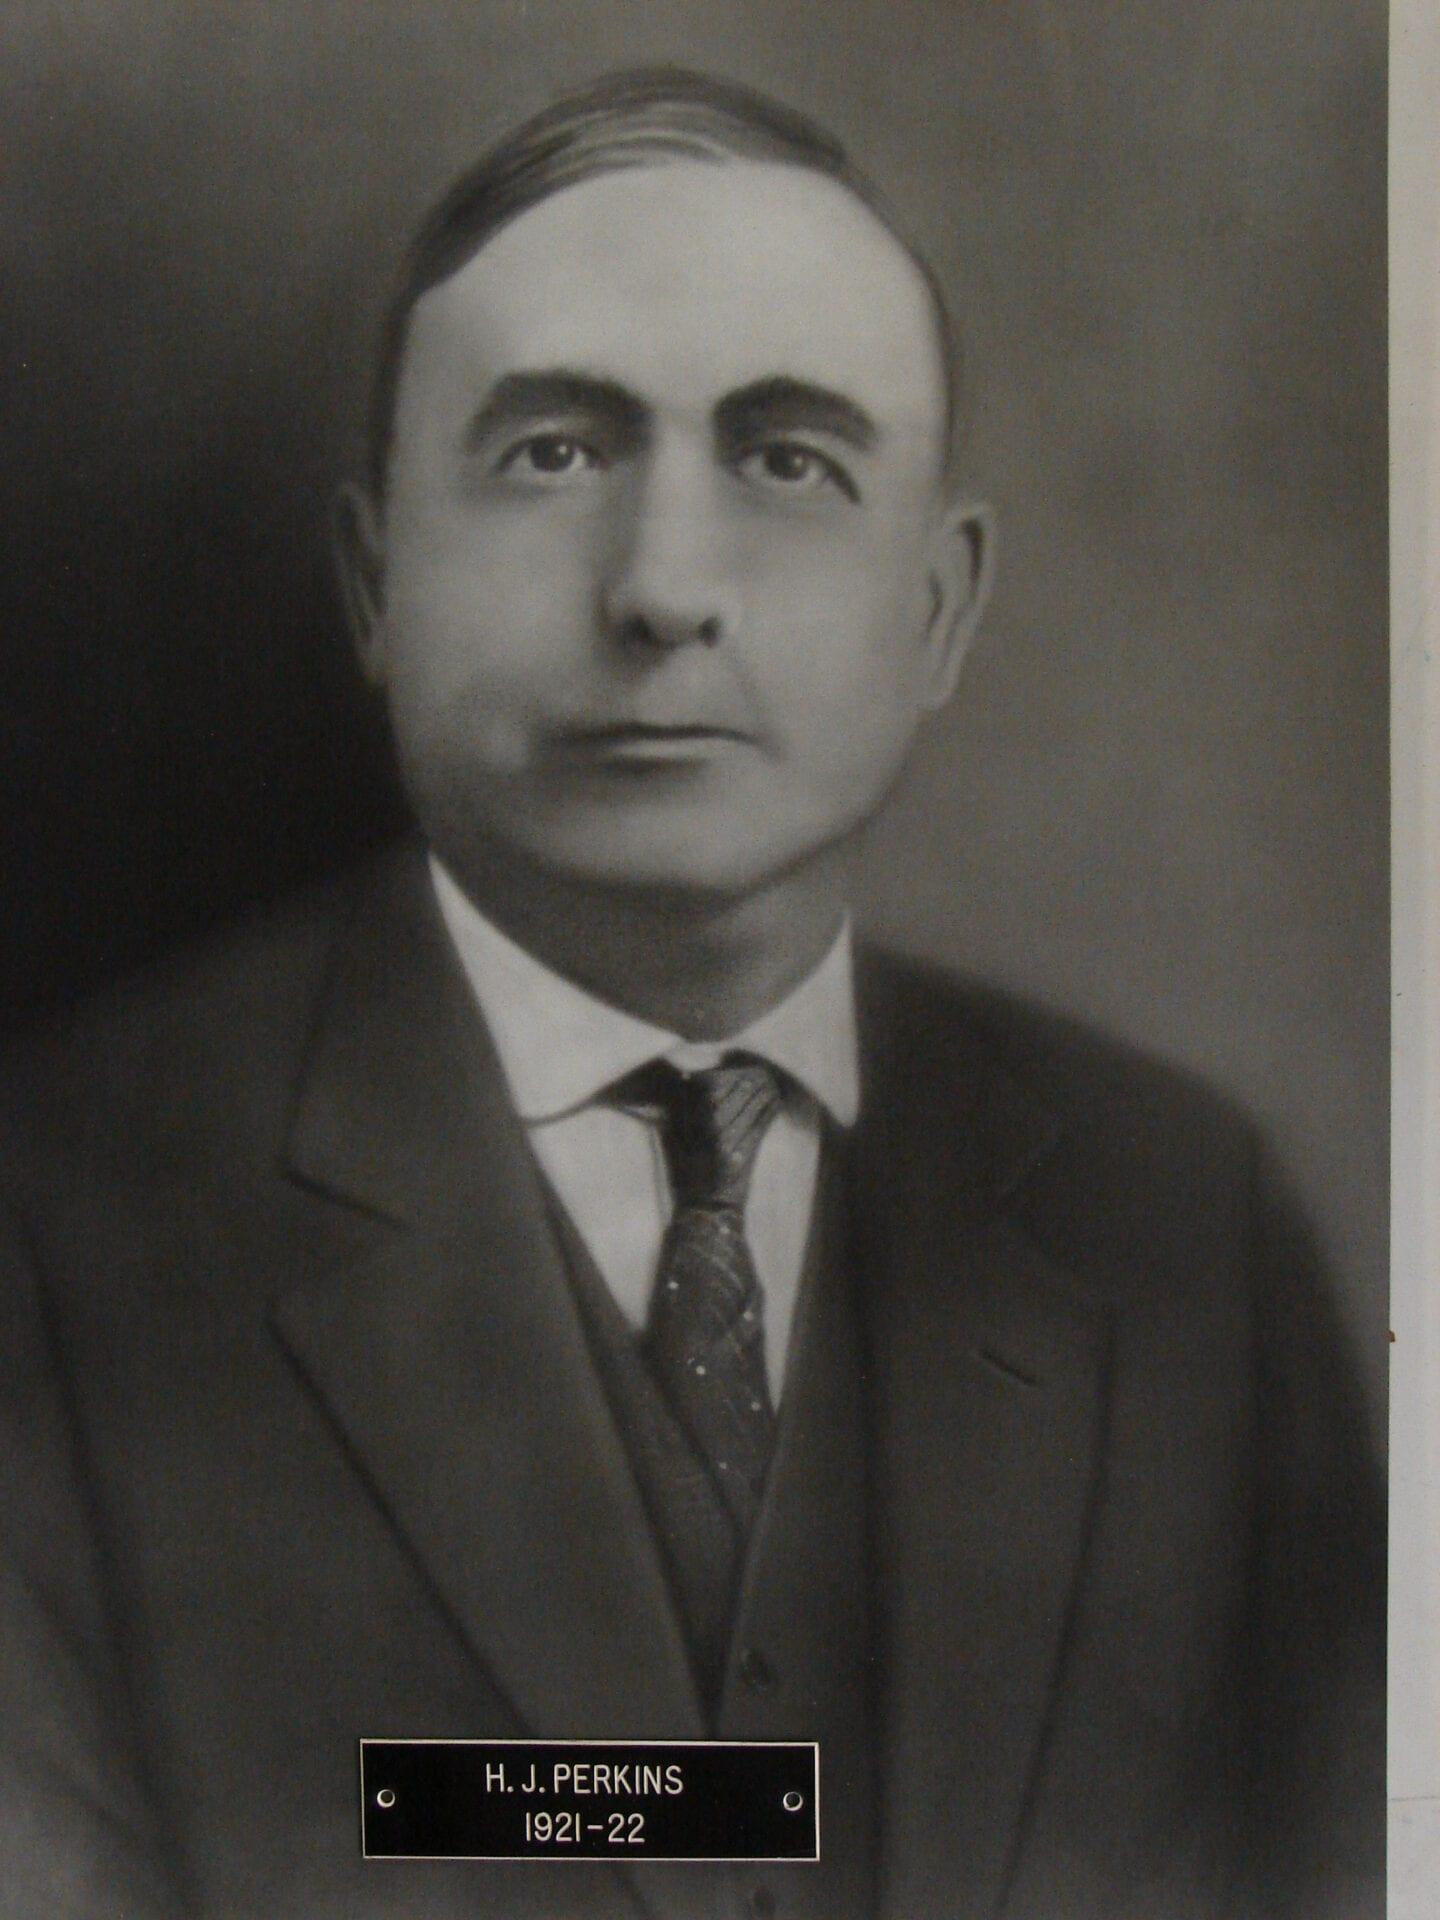 H J Perkins